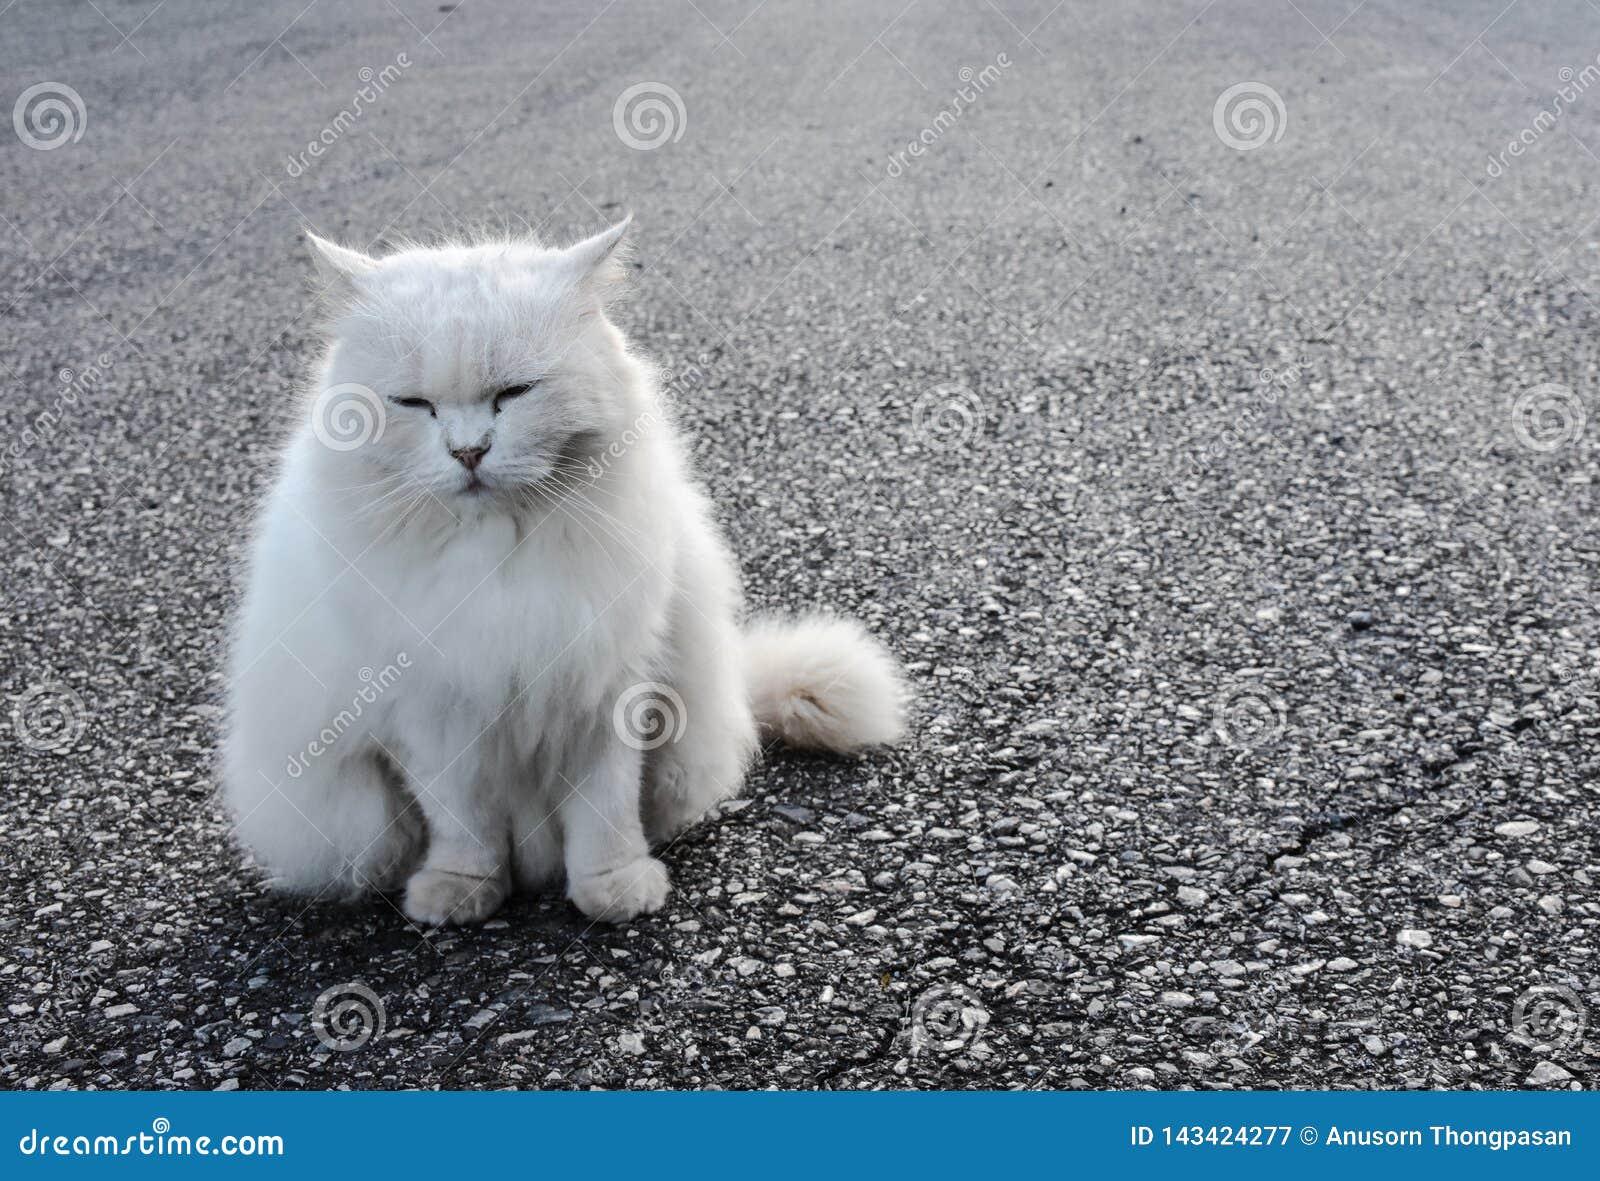 The white cat is sitting looking straight ahead.,defocus,spot focus